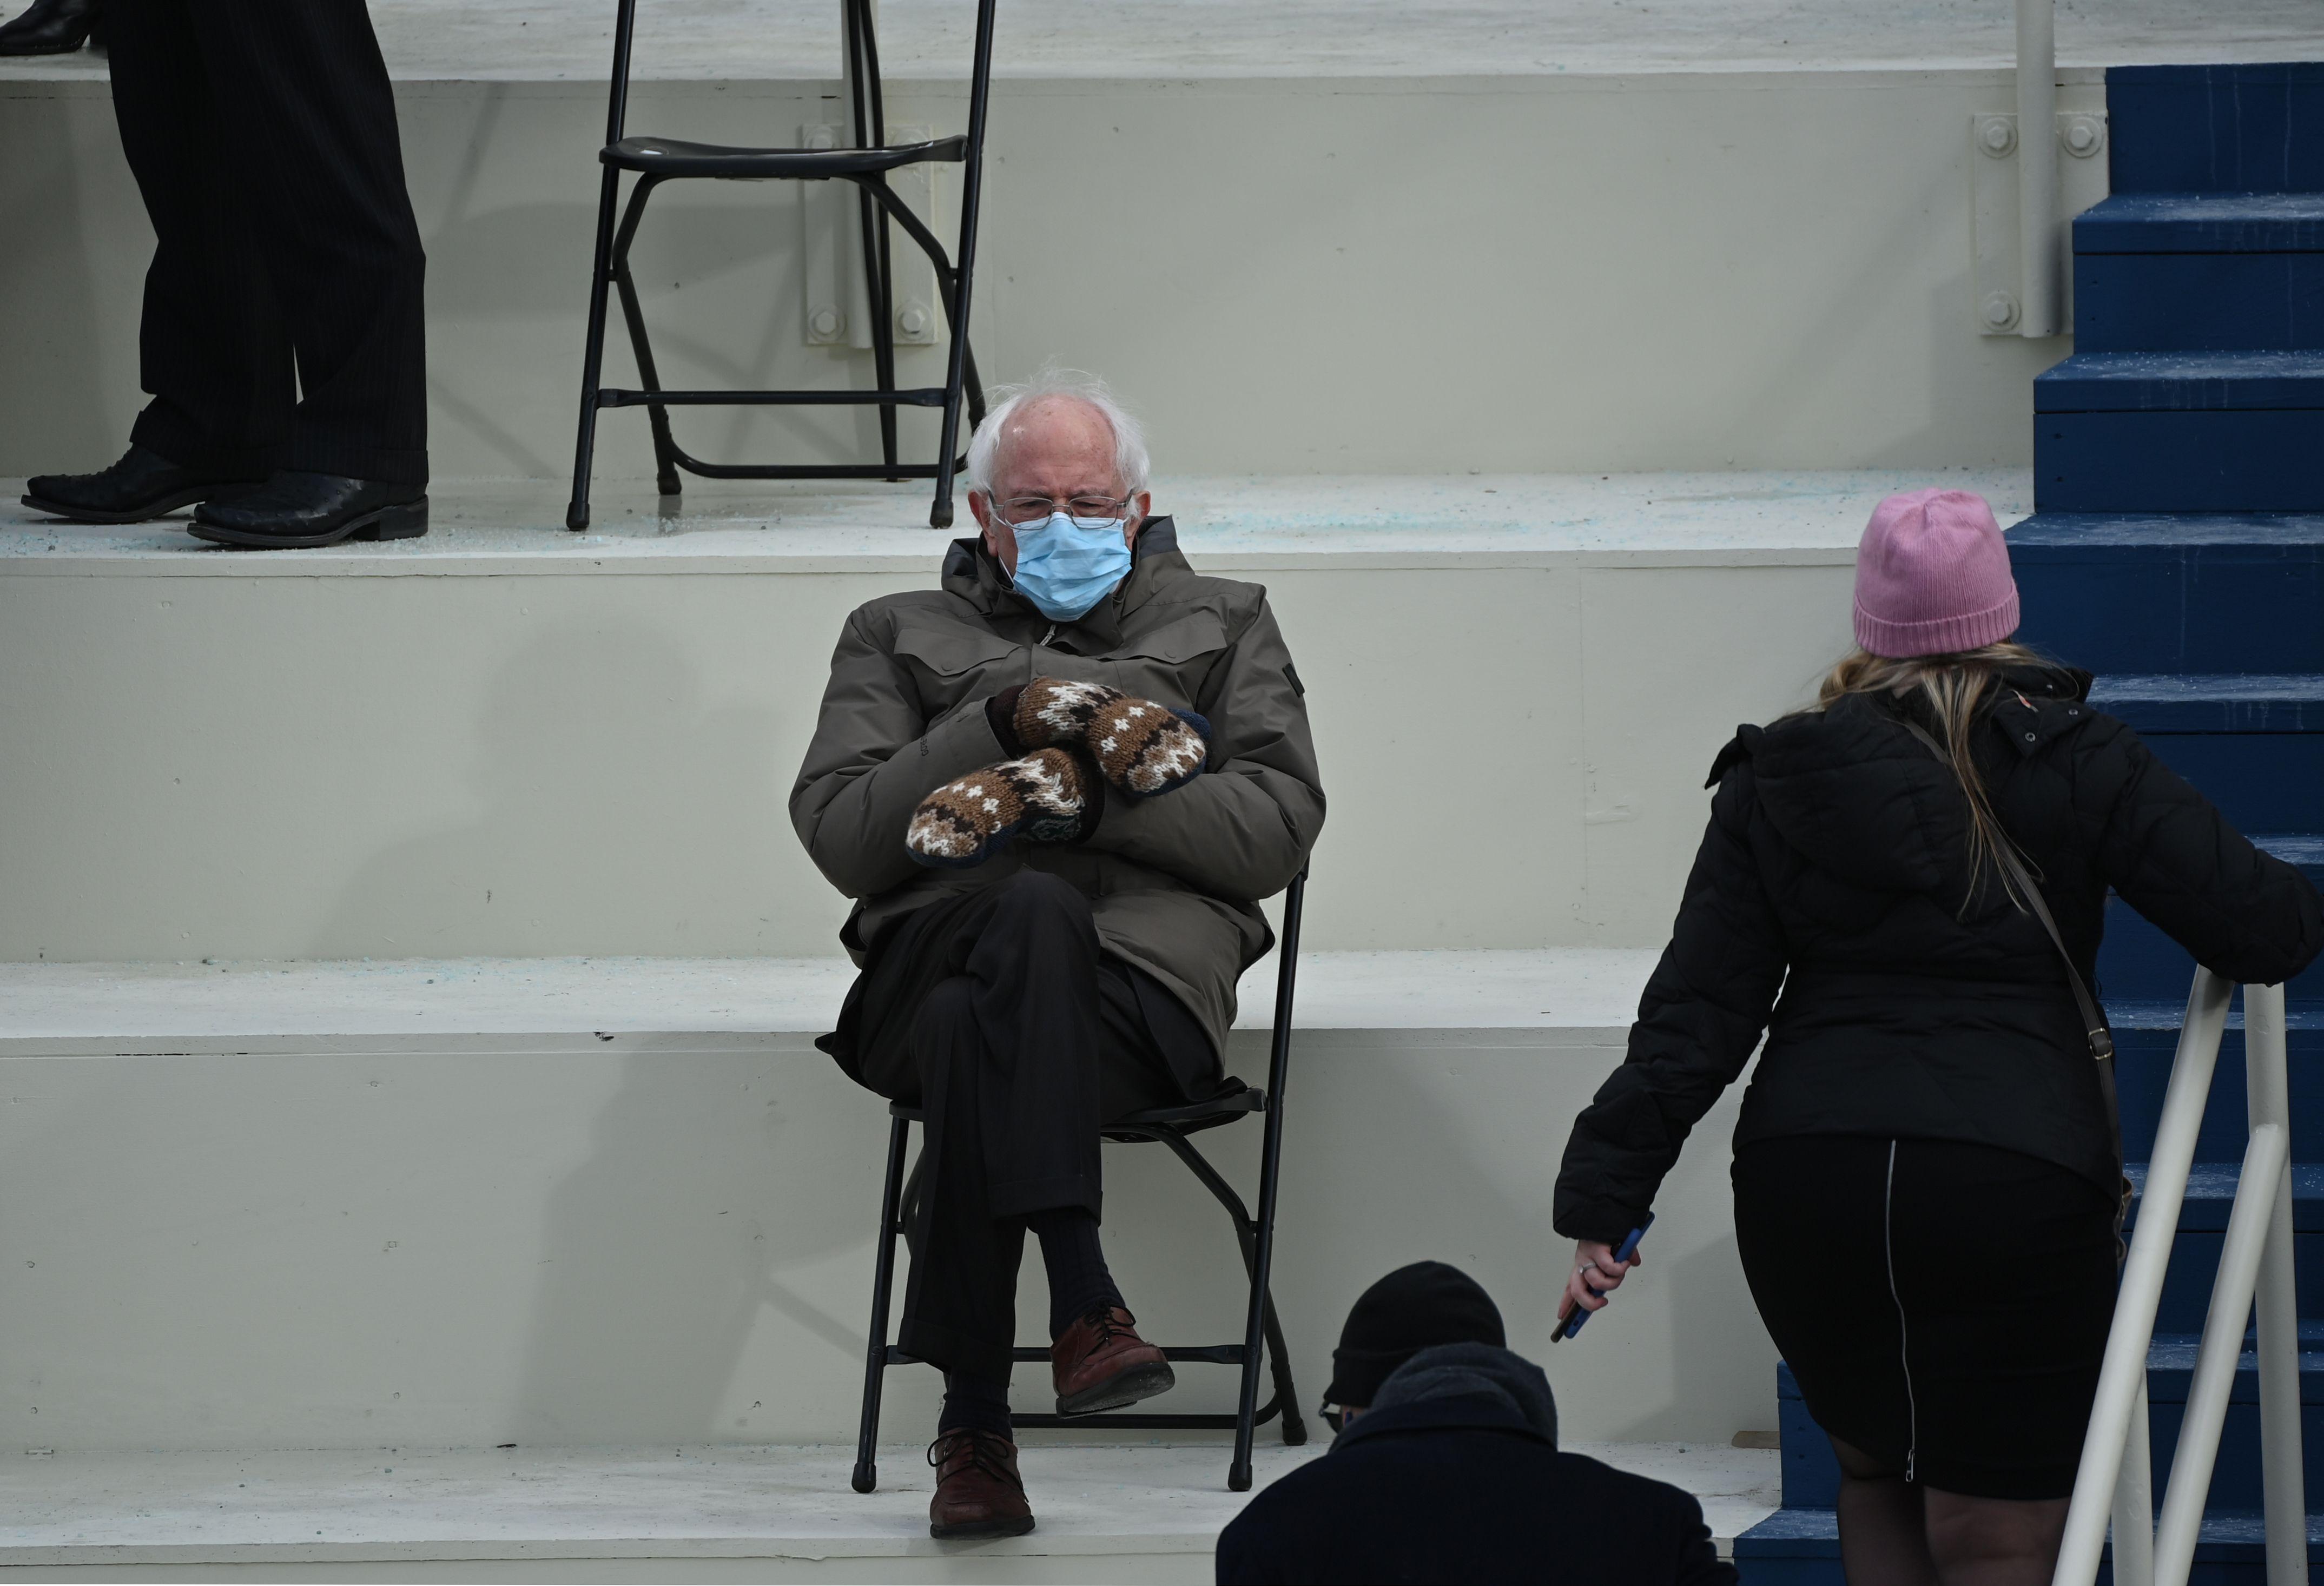 Sen. Bernie Sanders waiting at Capitol Hill ahead of Joe Biden's inauguration